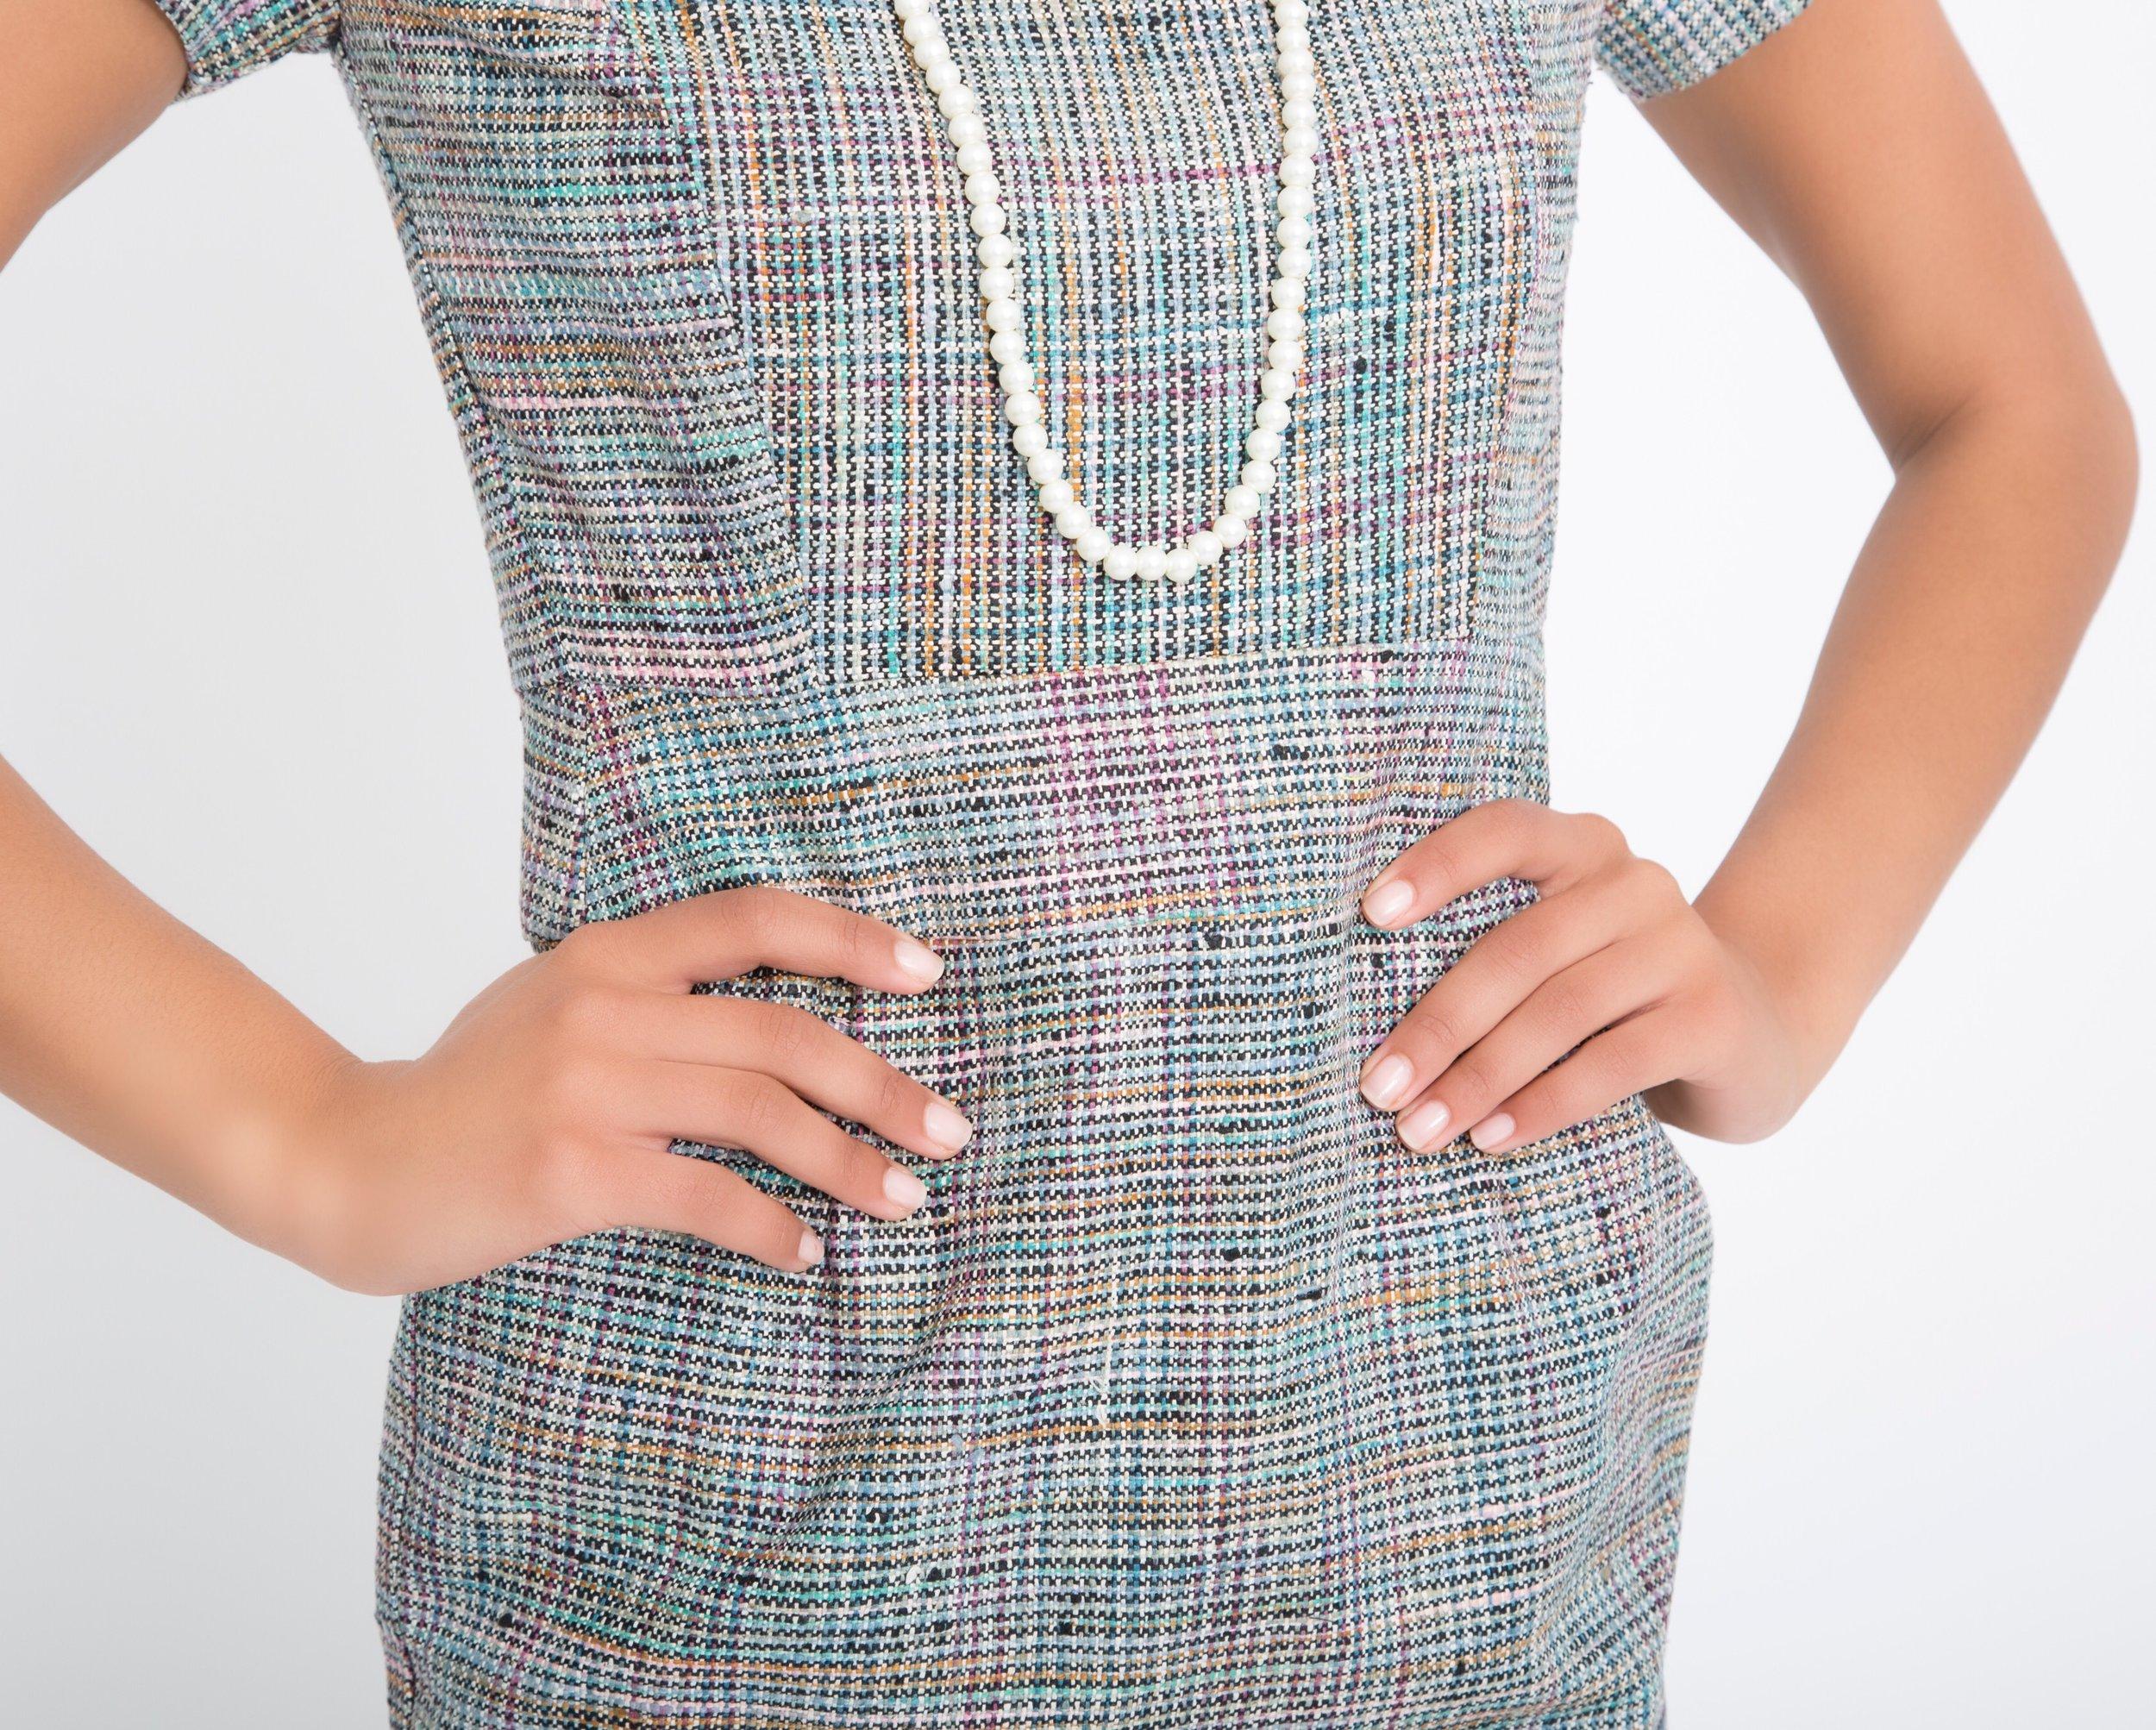 Work dress by NATIA ERIN